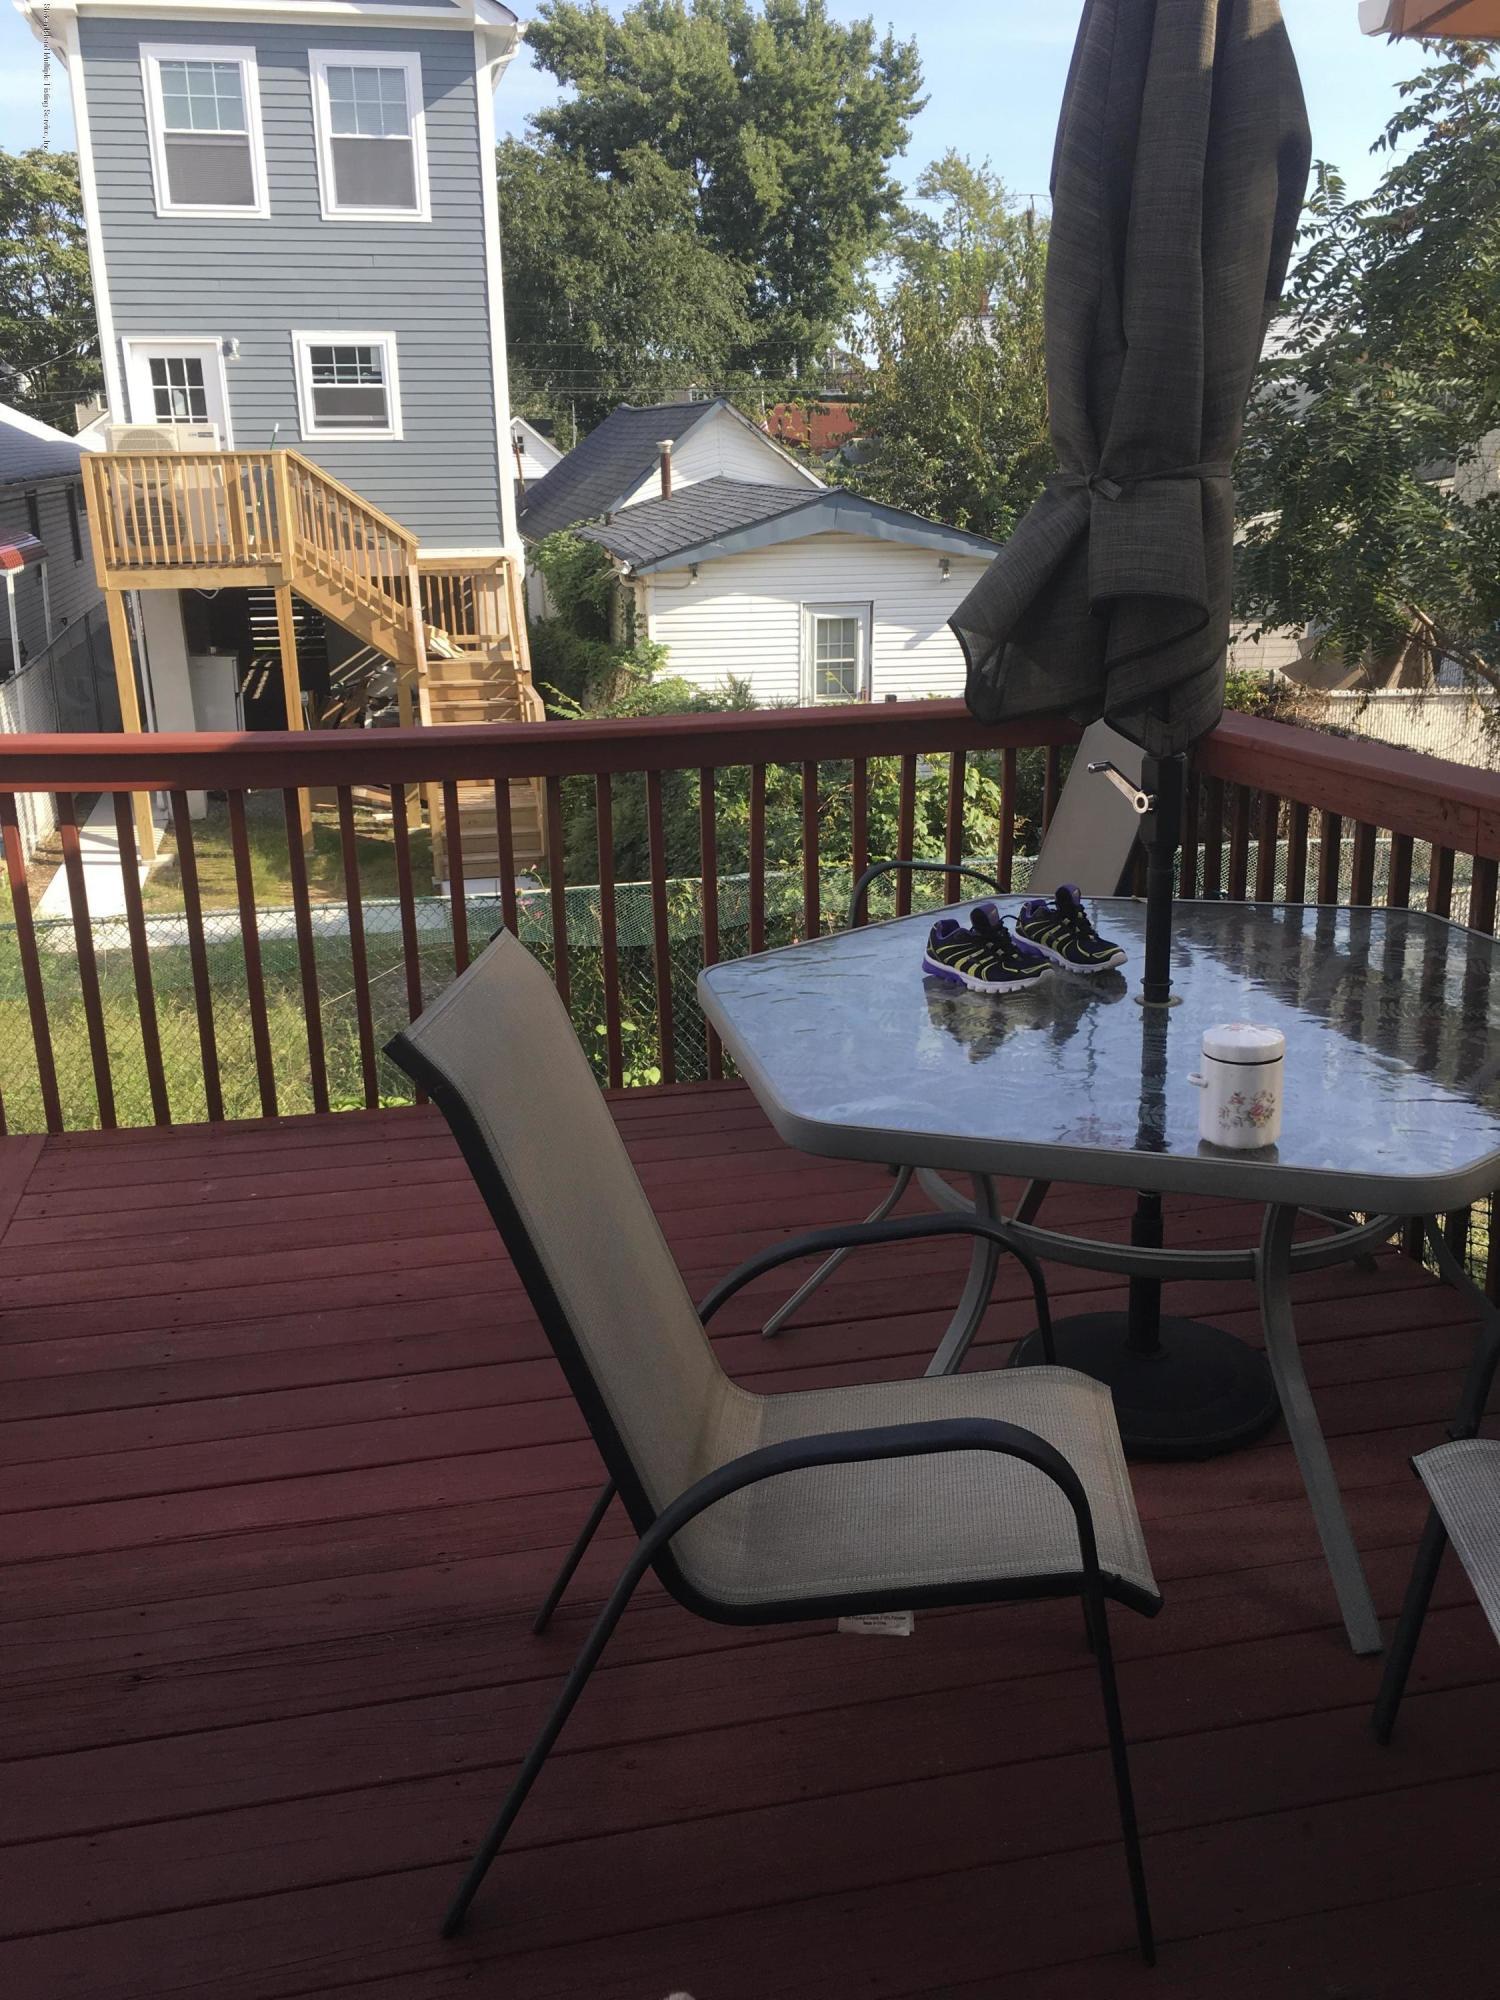 Single Family - Semi-Attached 190 Moreland Street  Staten Island, NY 10306, MLS-1123255-16